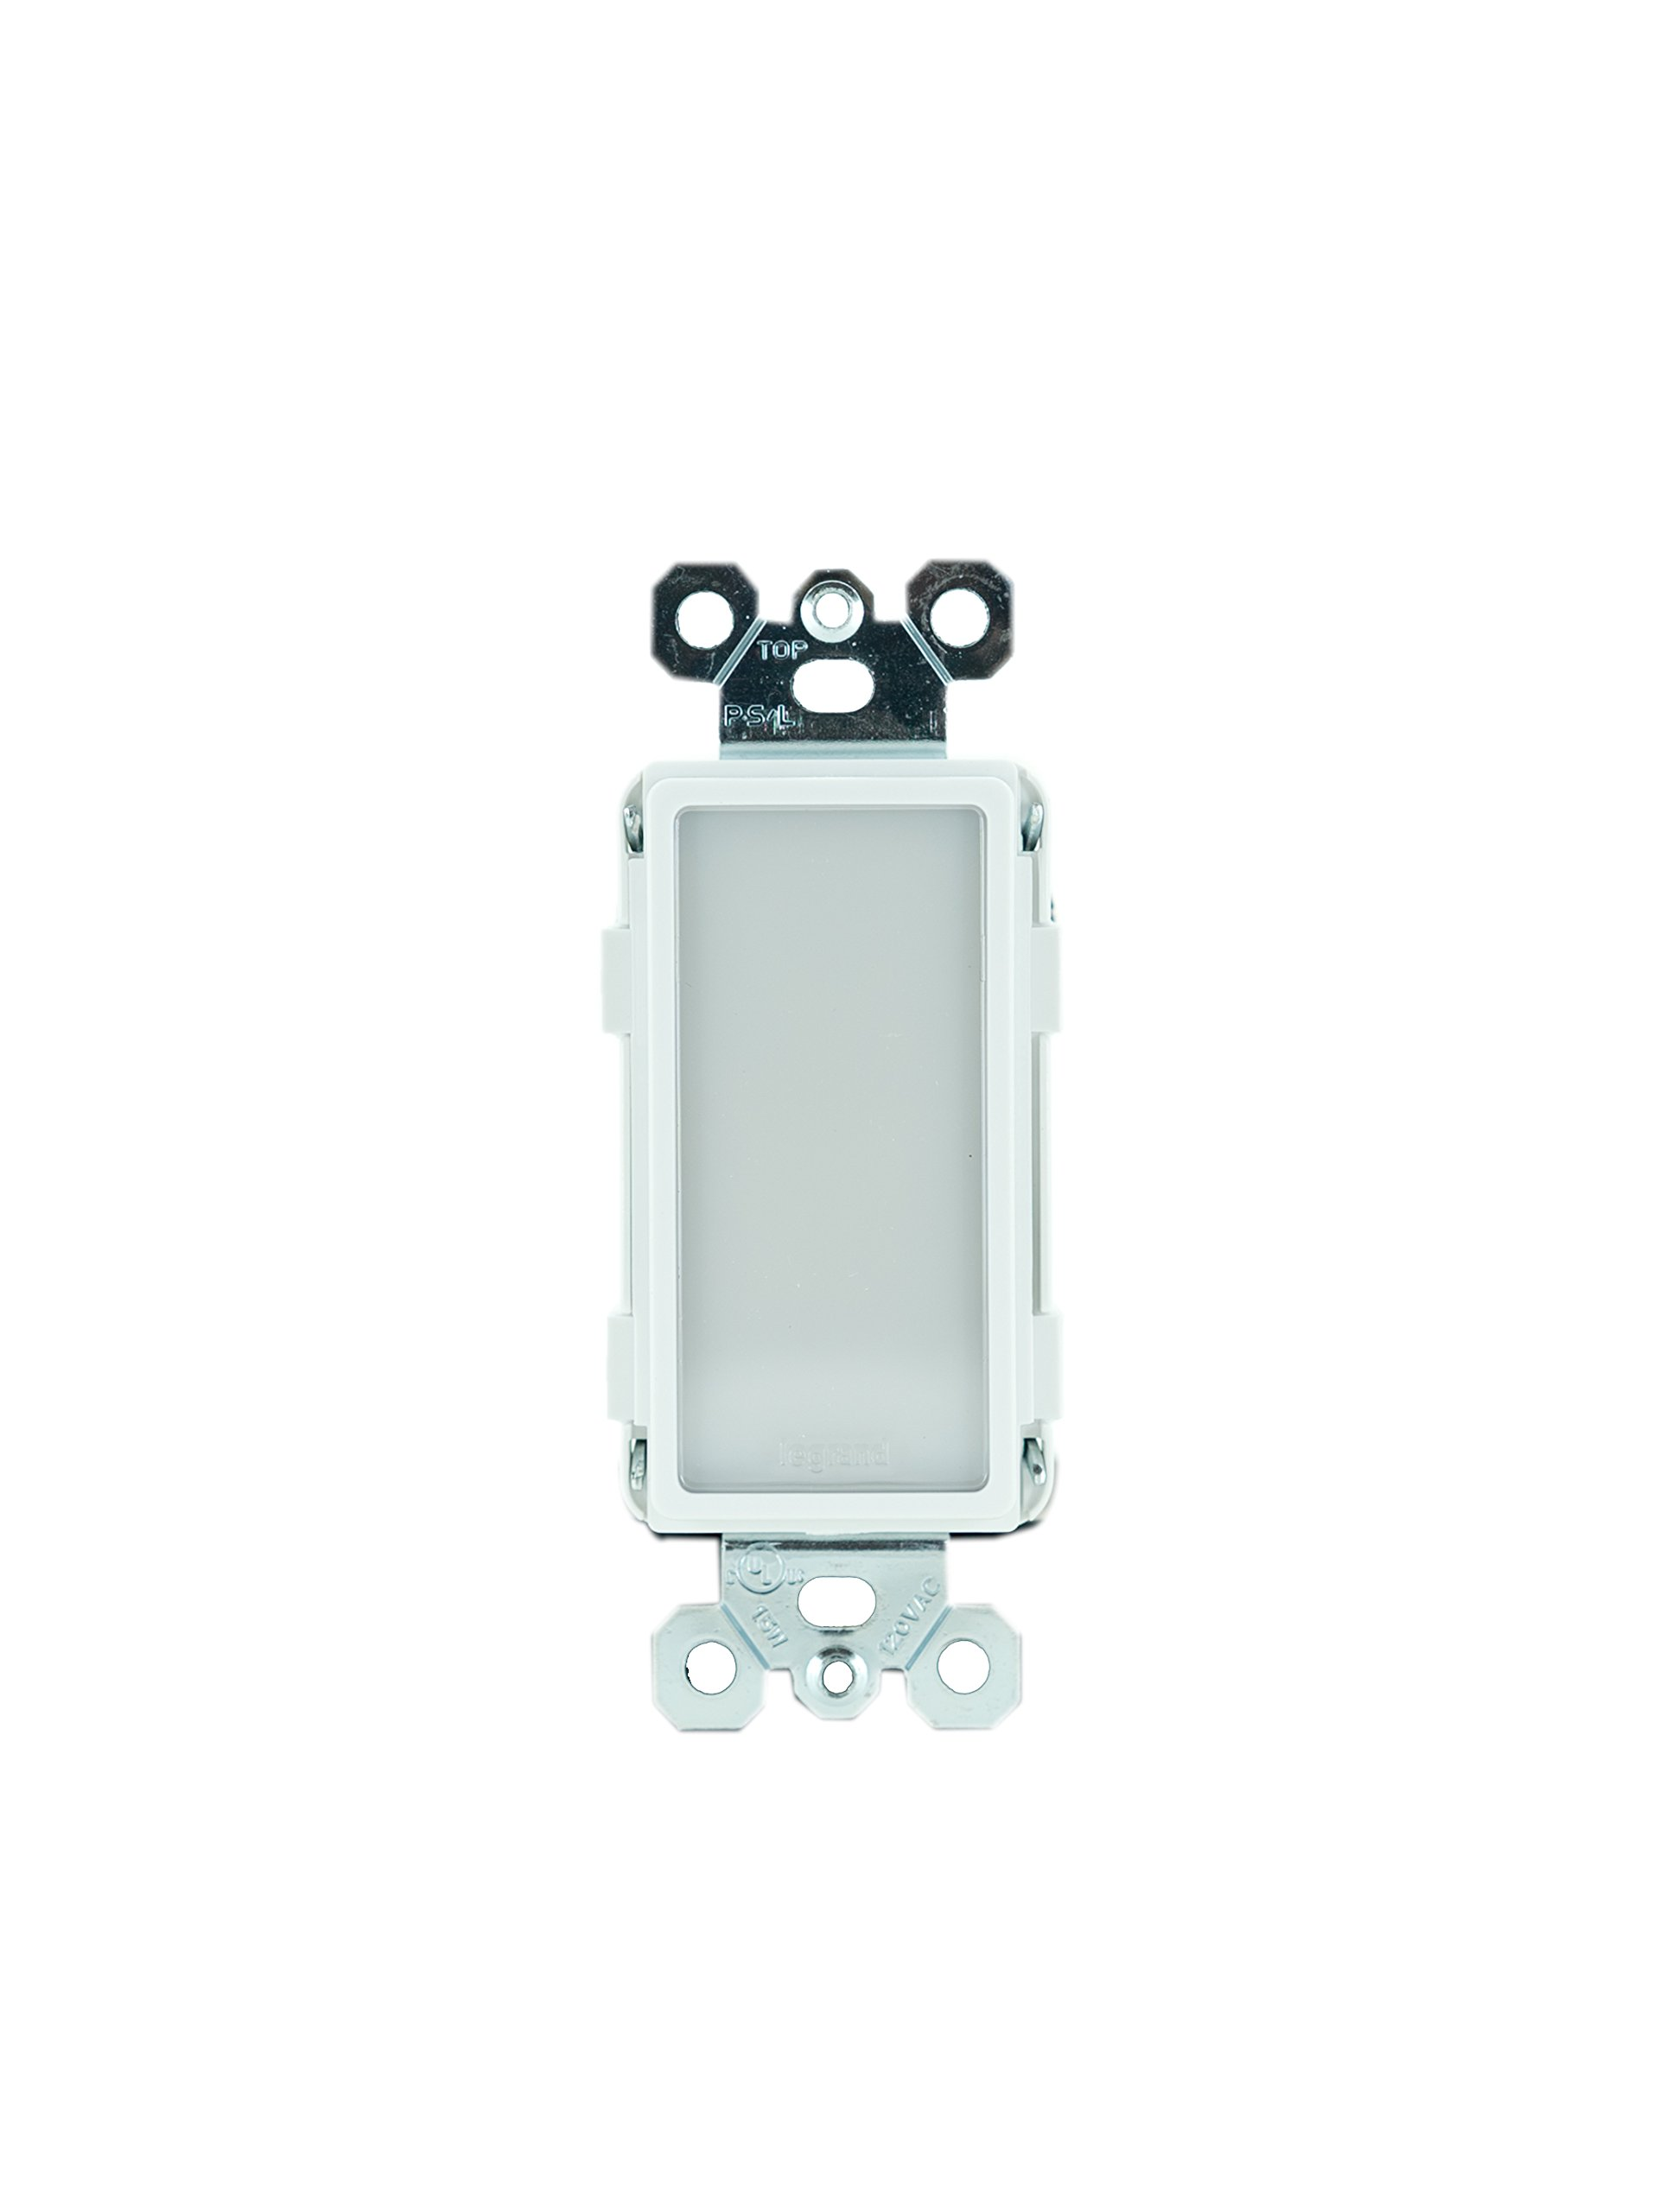 Legrand - Pass & Seymour radiant NTLFULLWCC6 Full LED Night Light with Adjustable Light Levels, White